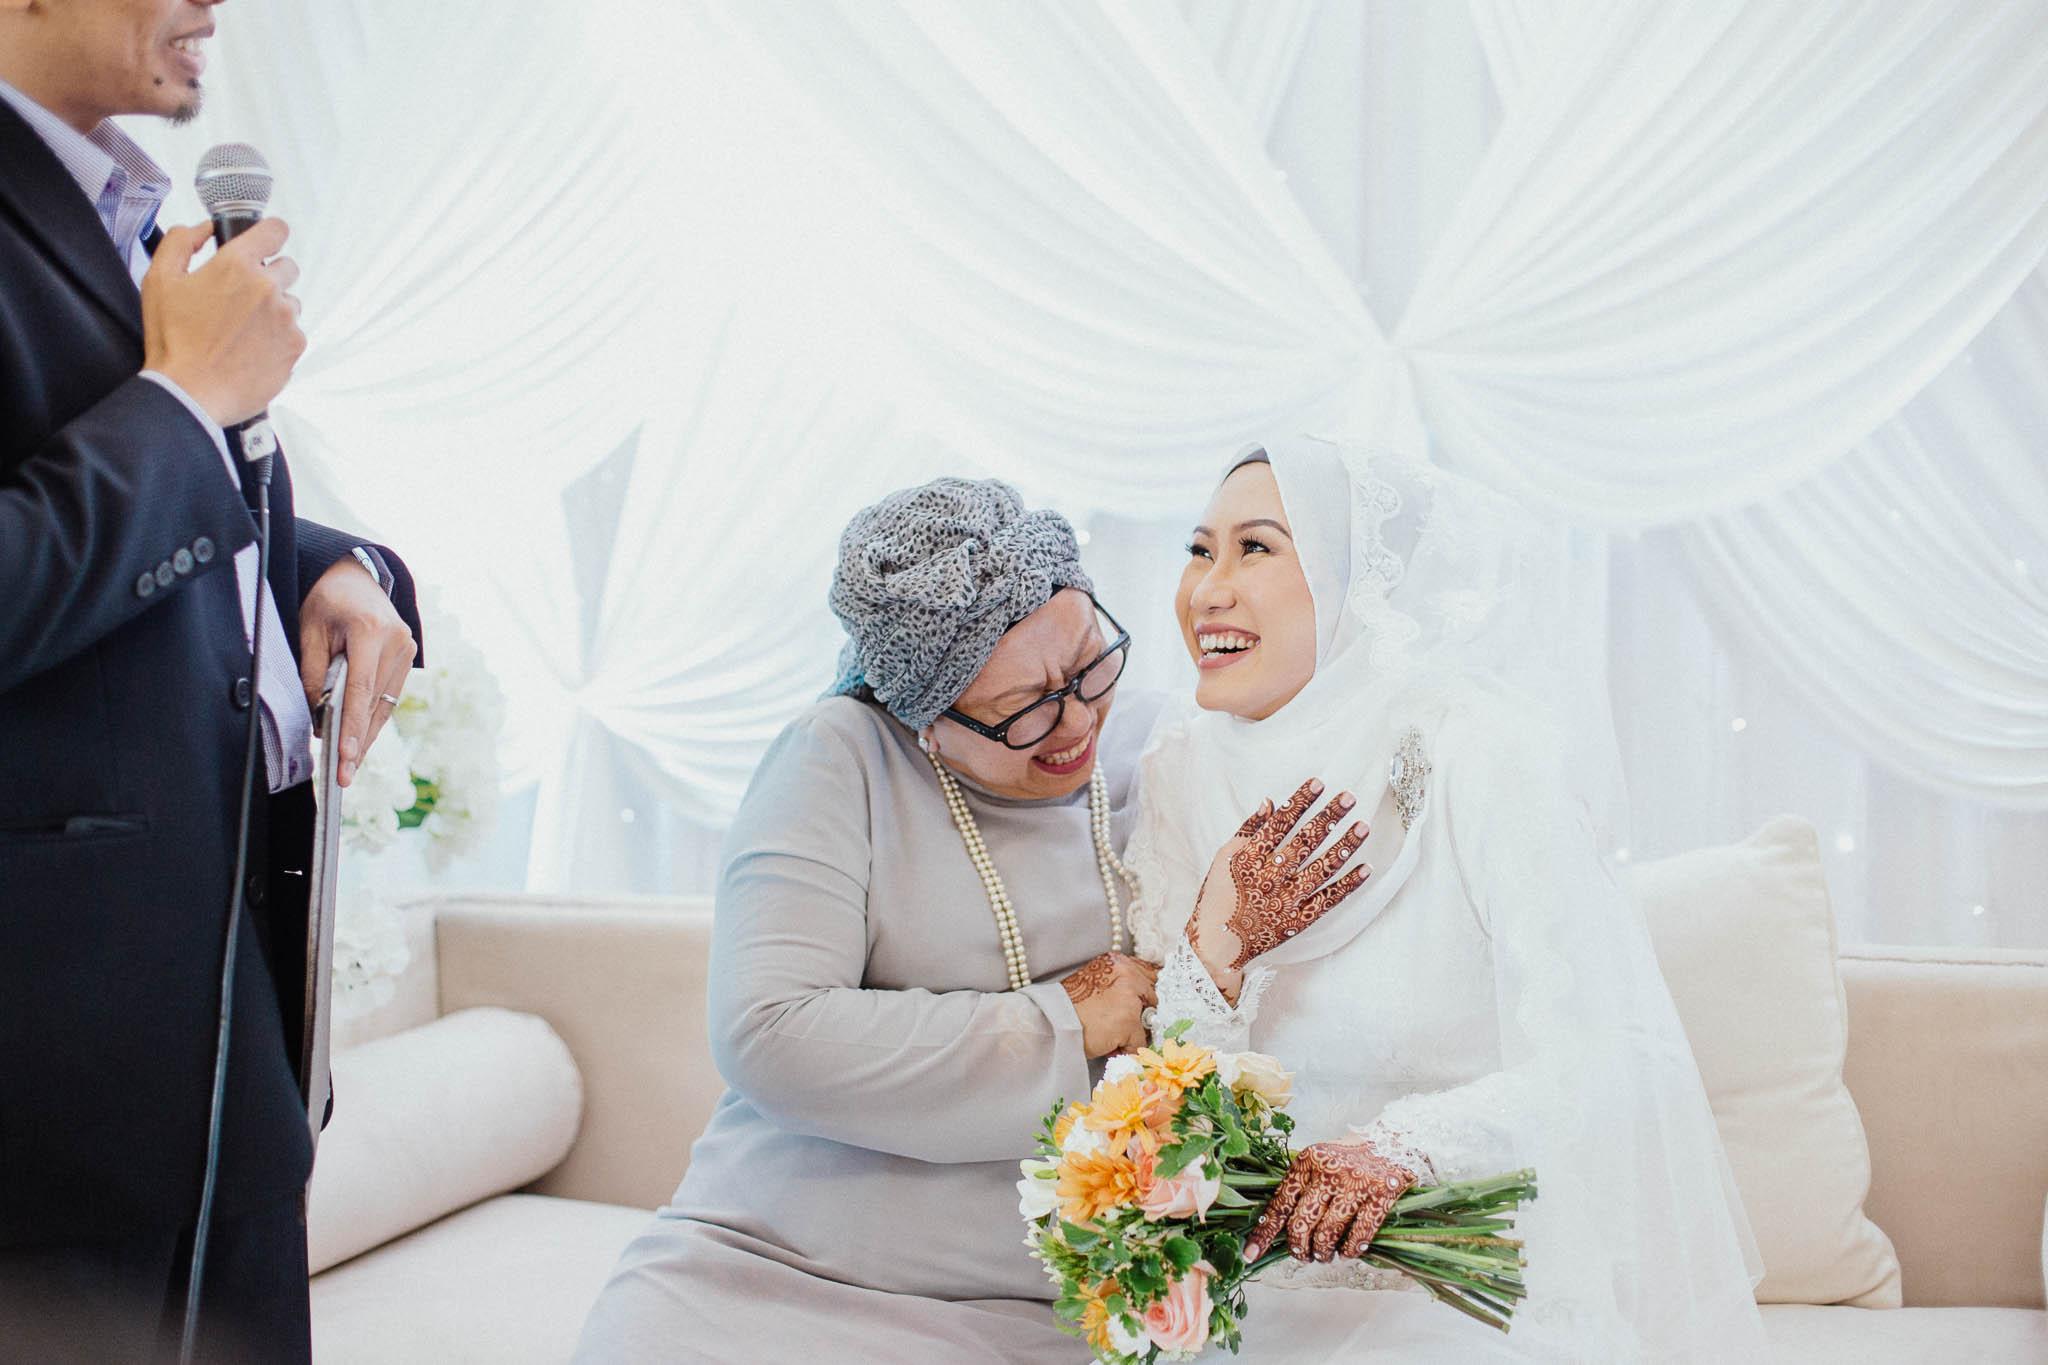 singapore-wedding-photographer-addafiq-nufail-017.jpg